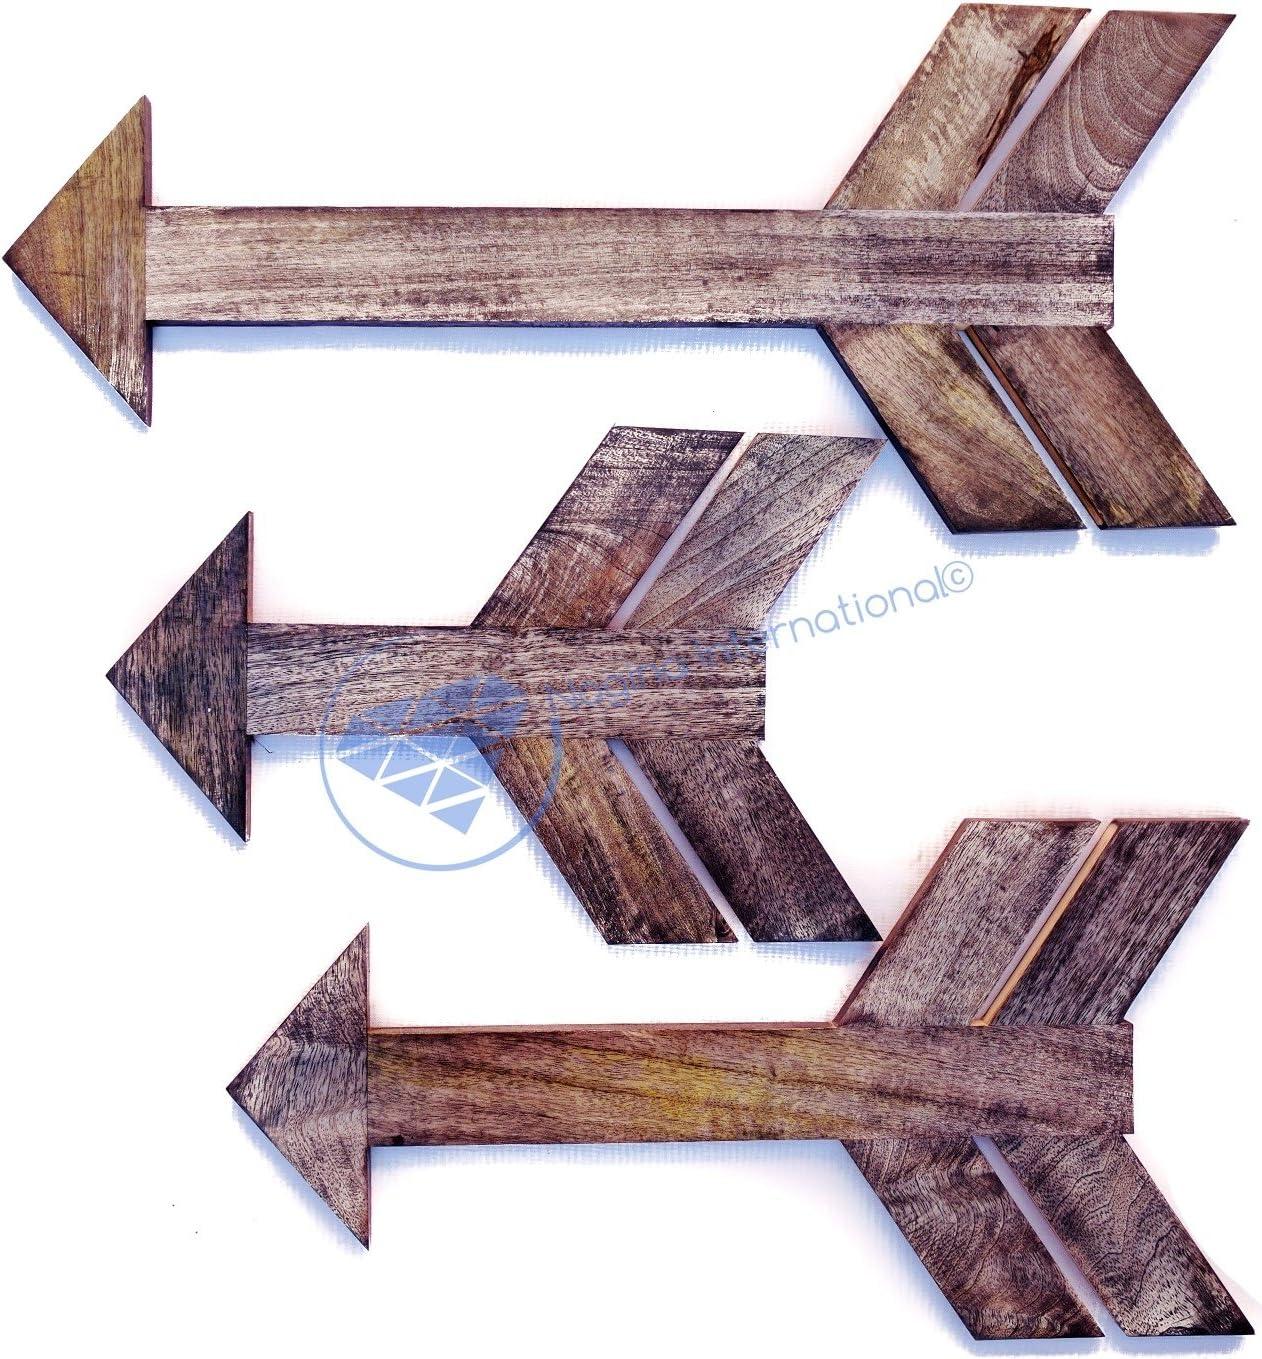 Nagina International Rustic Wooden Arrows Set of 3 Arrows Wood Arrow Decor Arrow Wall Decor Rustic Home Decor Arrow Sign Modern Wood Arrow